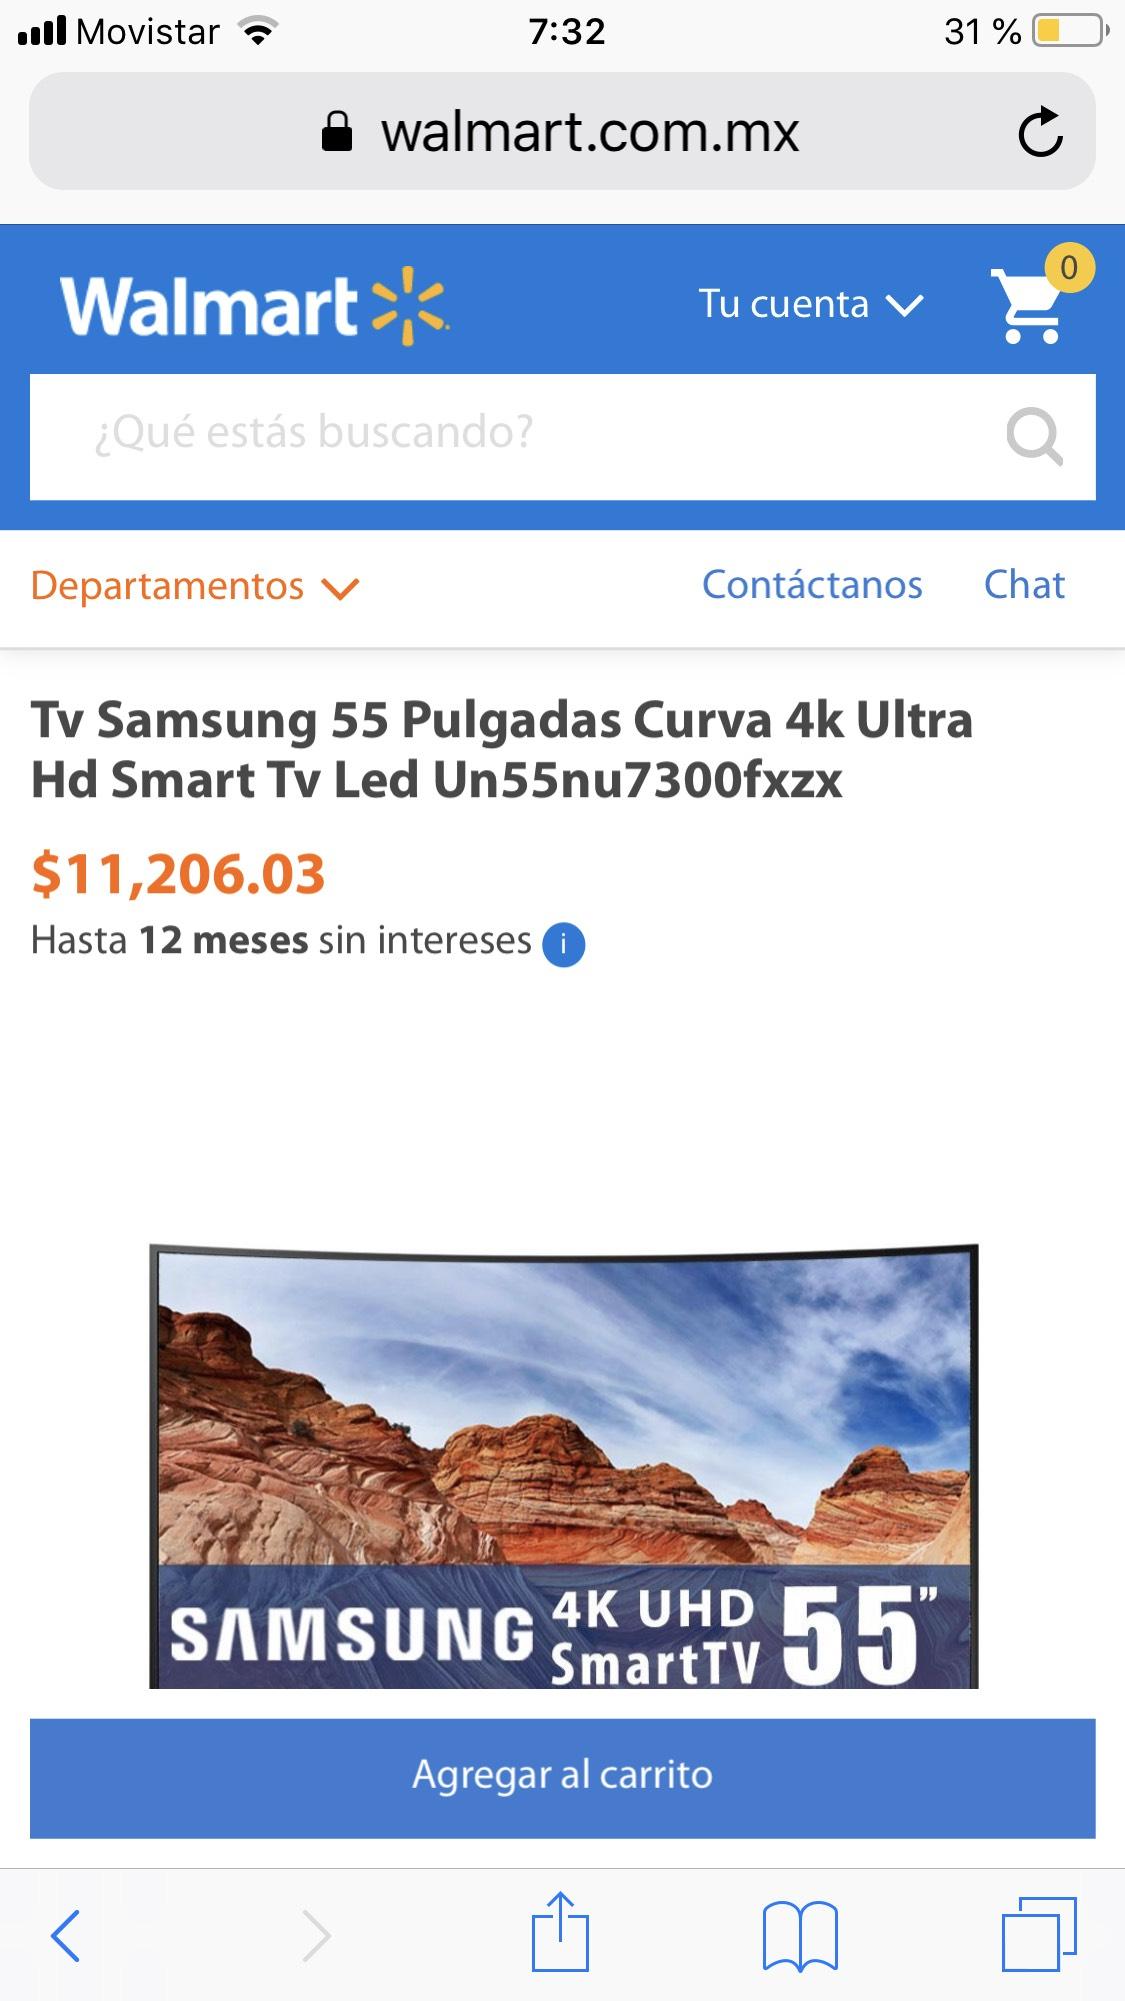 Walmart: Tv Samsung 55 Pulgadas Curva 4k Ultra Hd Smart Tv Led Un55nu7300fxzx